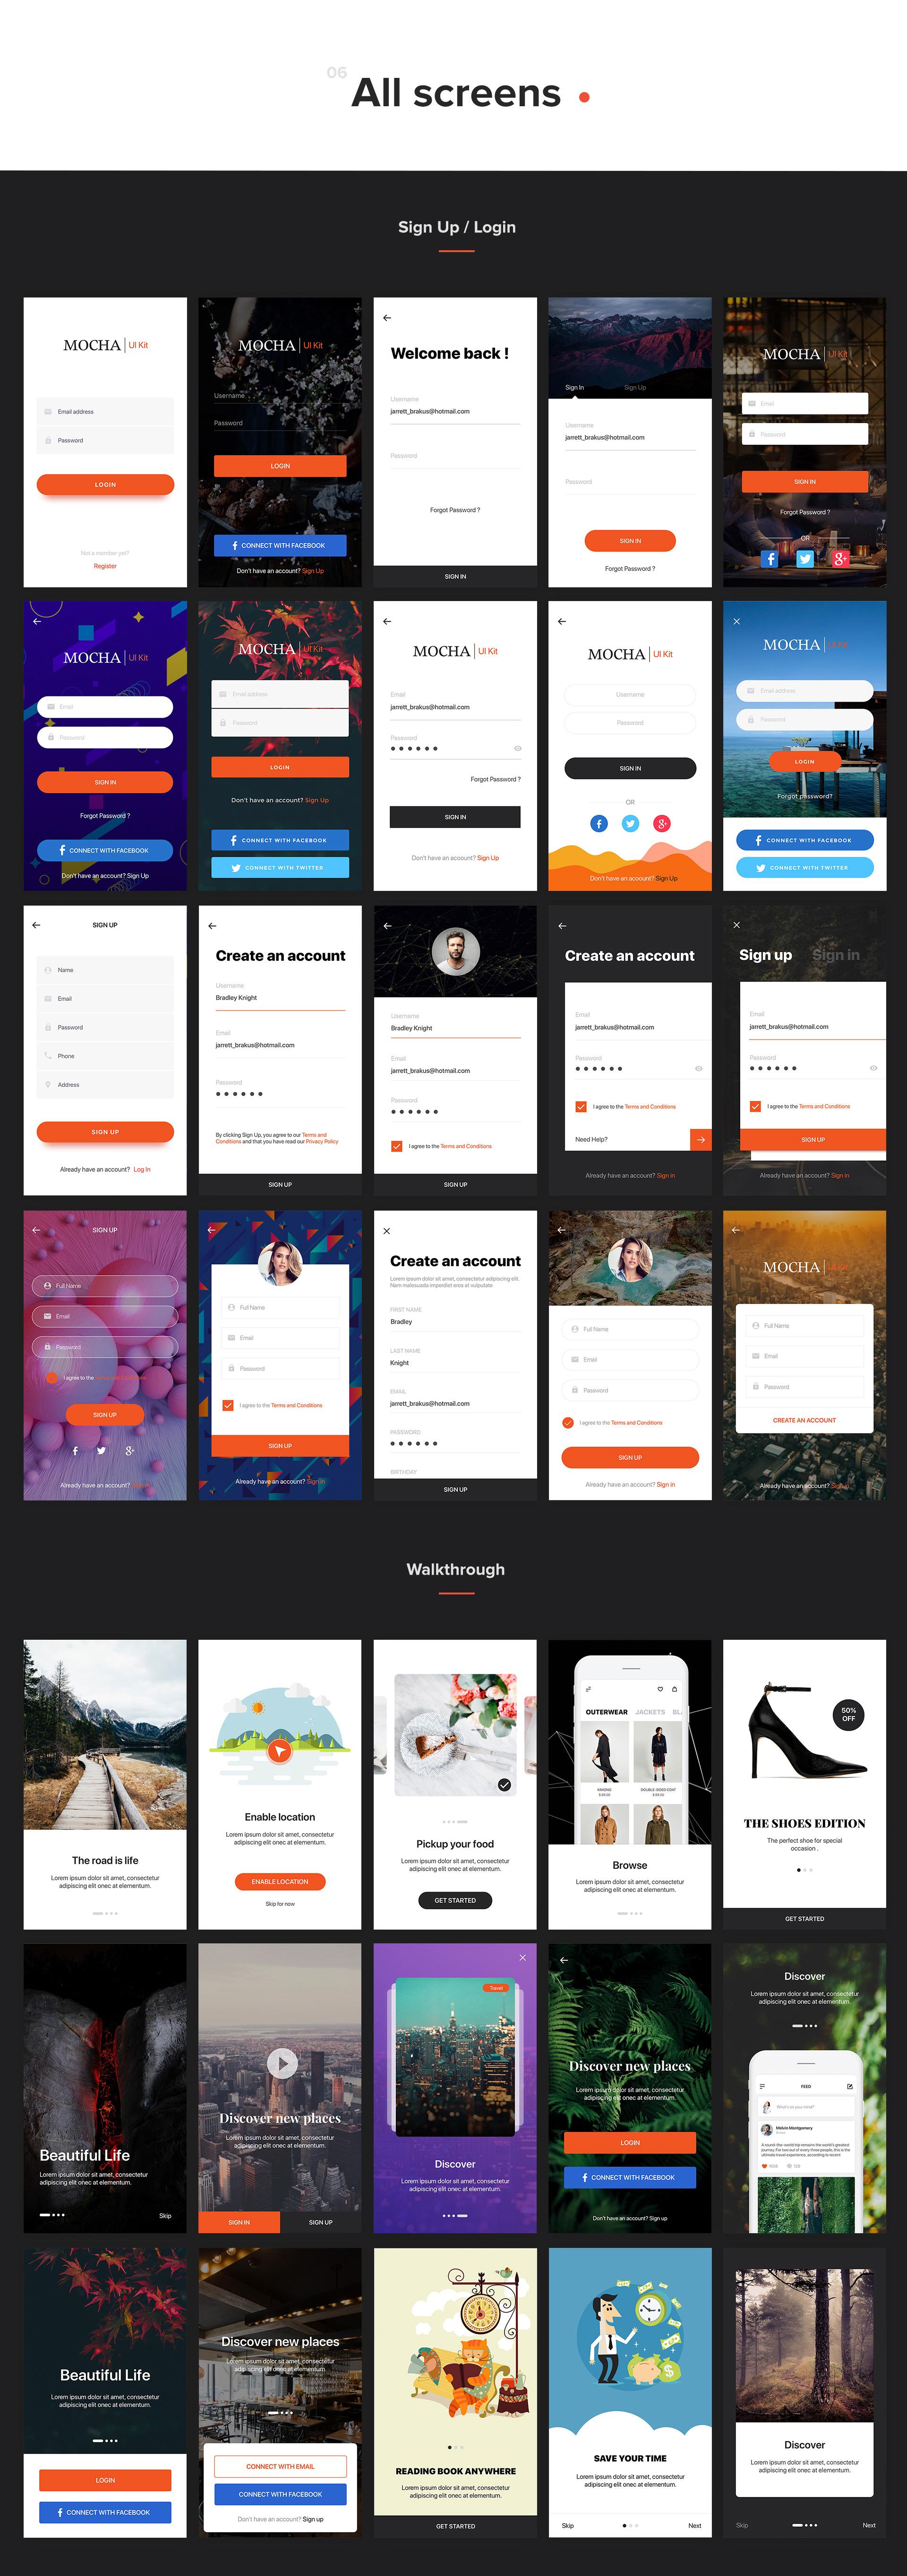 Mocha Mobile UI Kit - 3